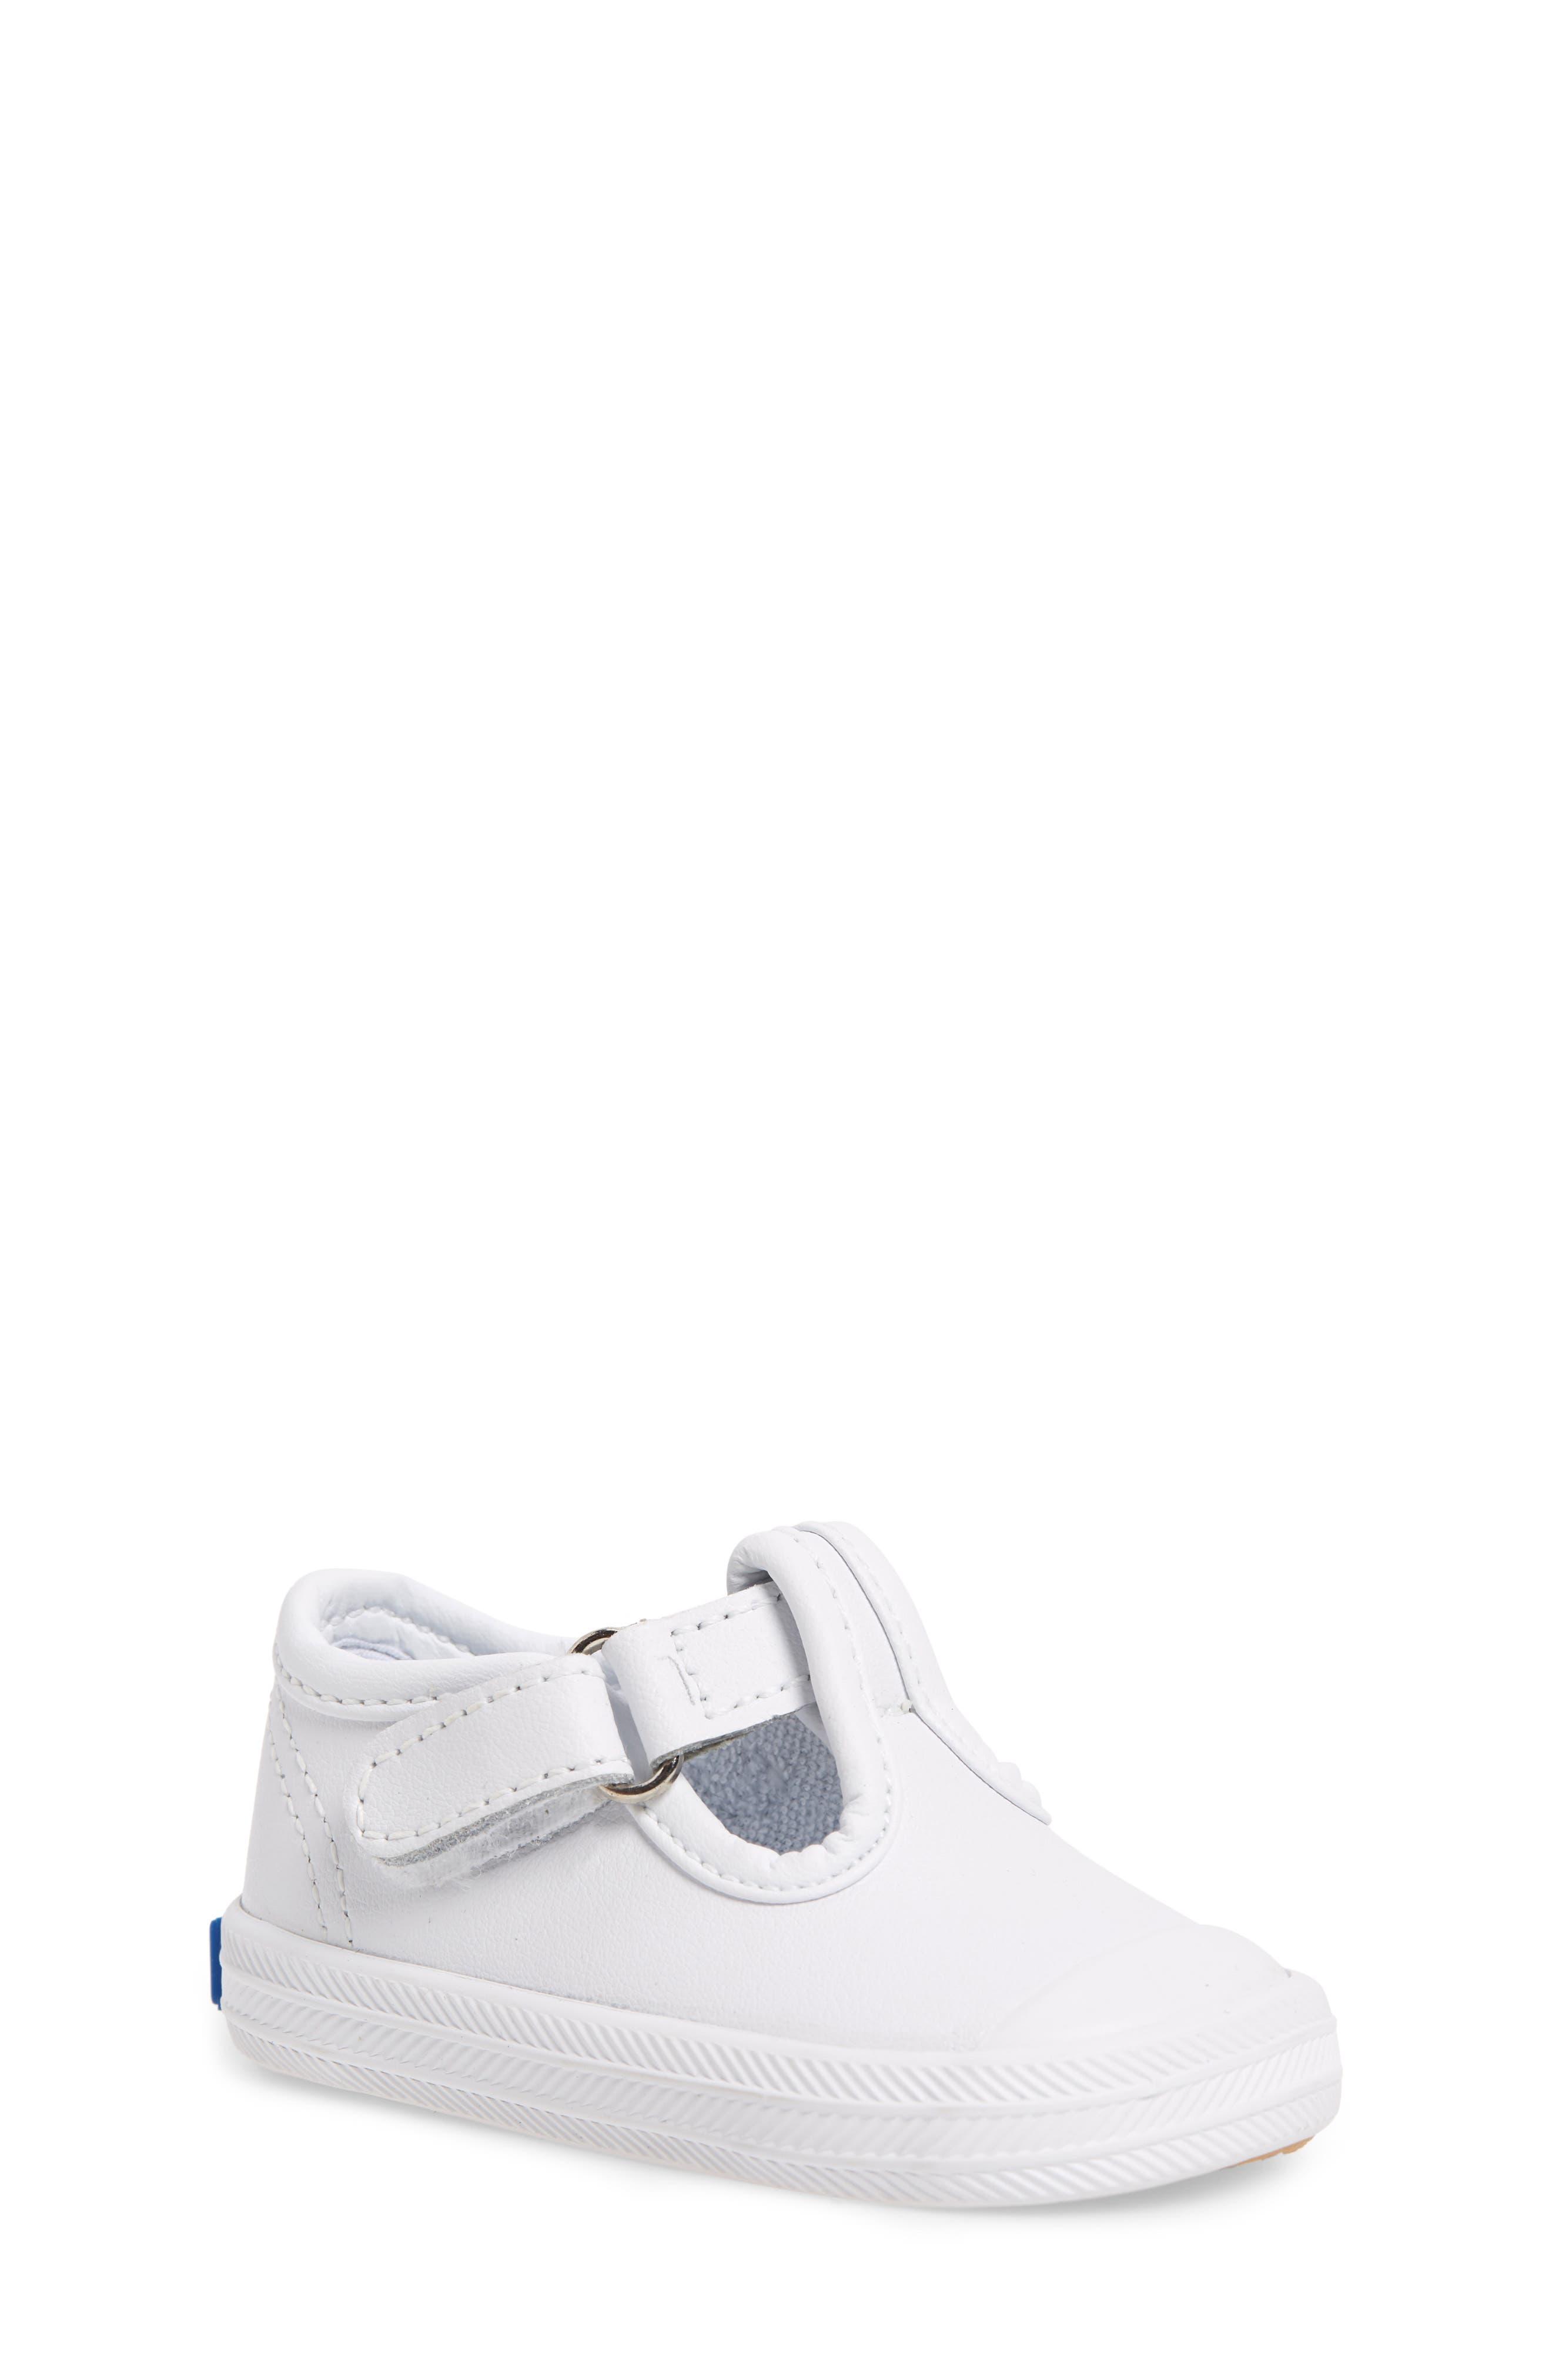 KEDS<SUP>®</SUP>, 'Champion' T-Strap Shoe, Main thumbnail 1, color, WHITE LEATHER